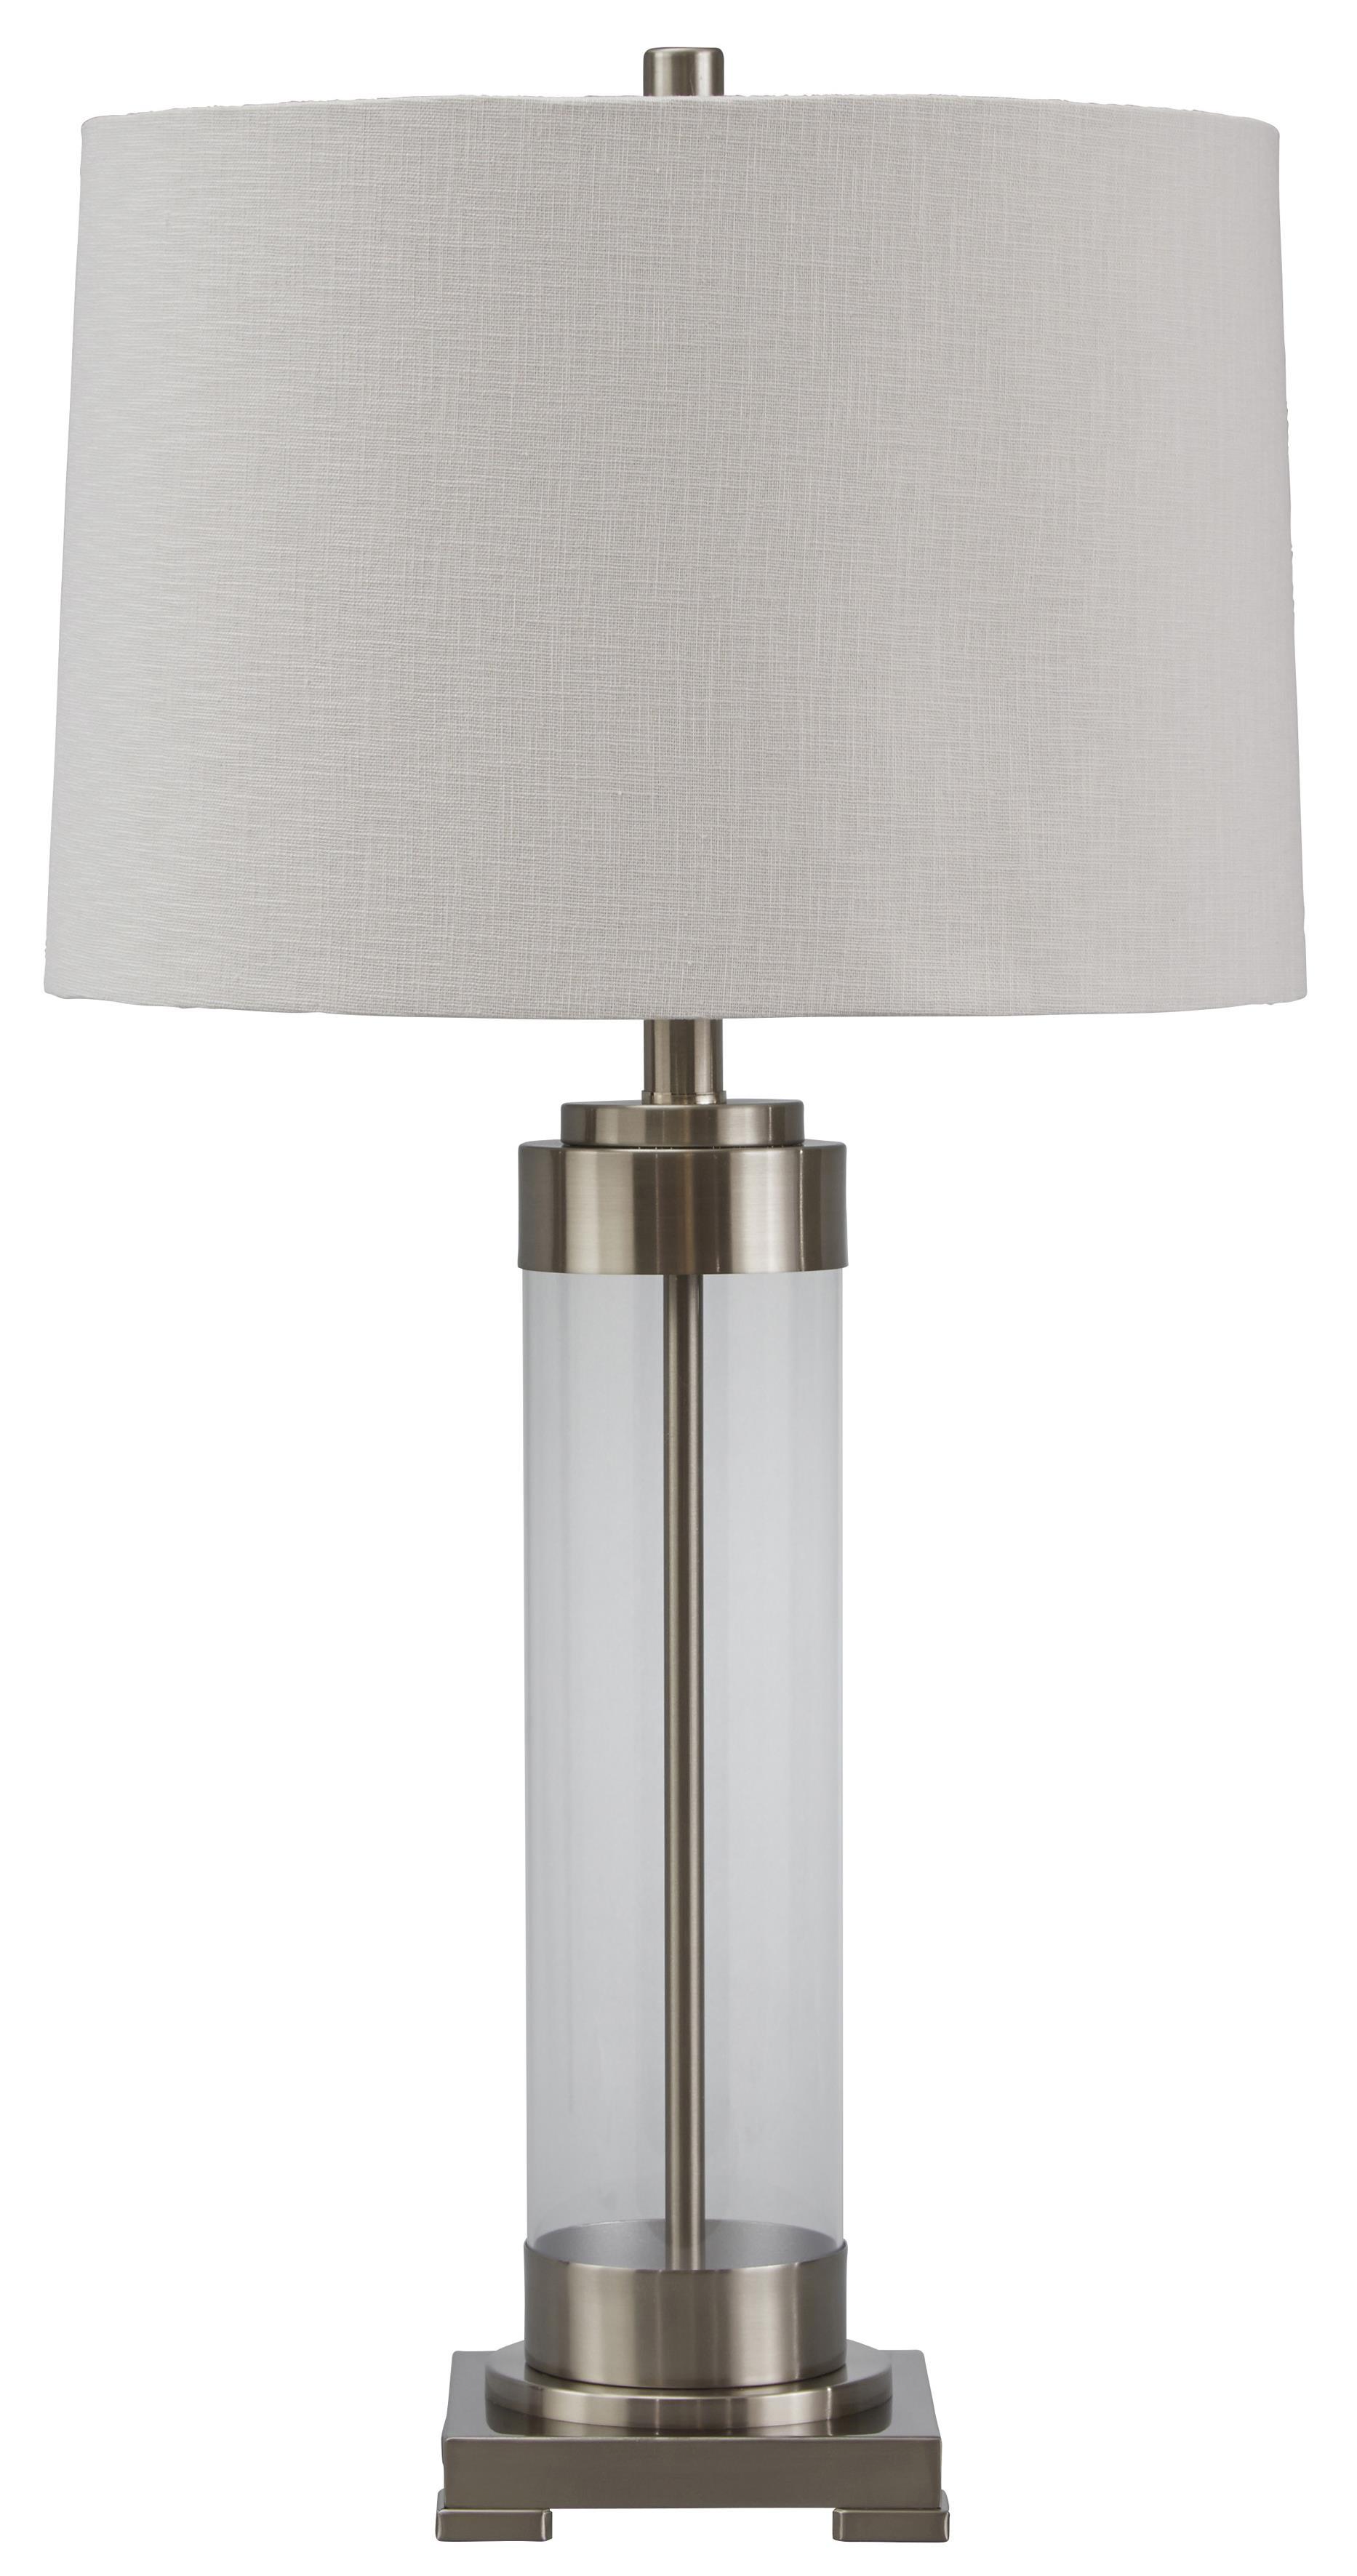 vintage style talar glass table lamp wayside furniture table lamps. Black Bedroom Furniture Sets. Home Design Ideas